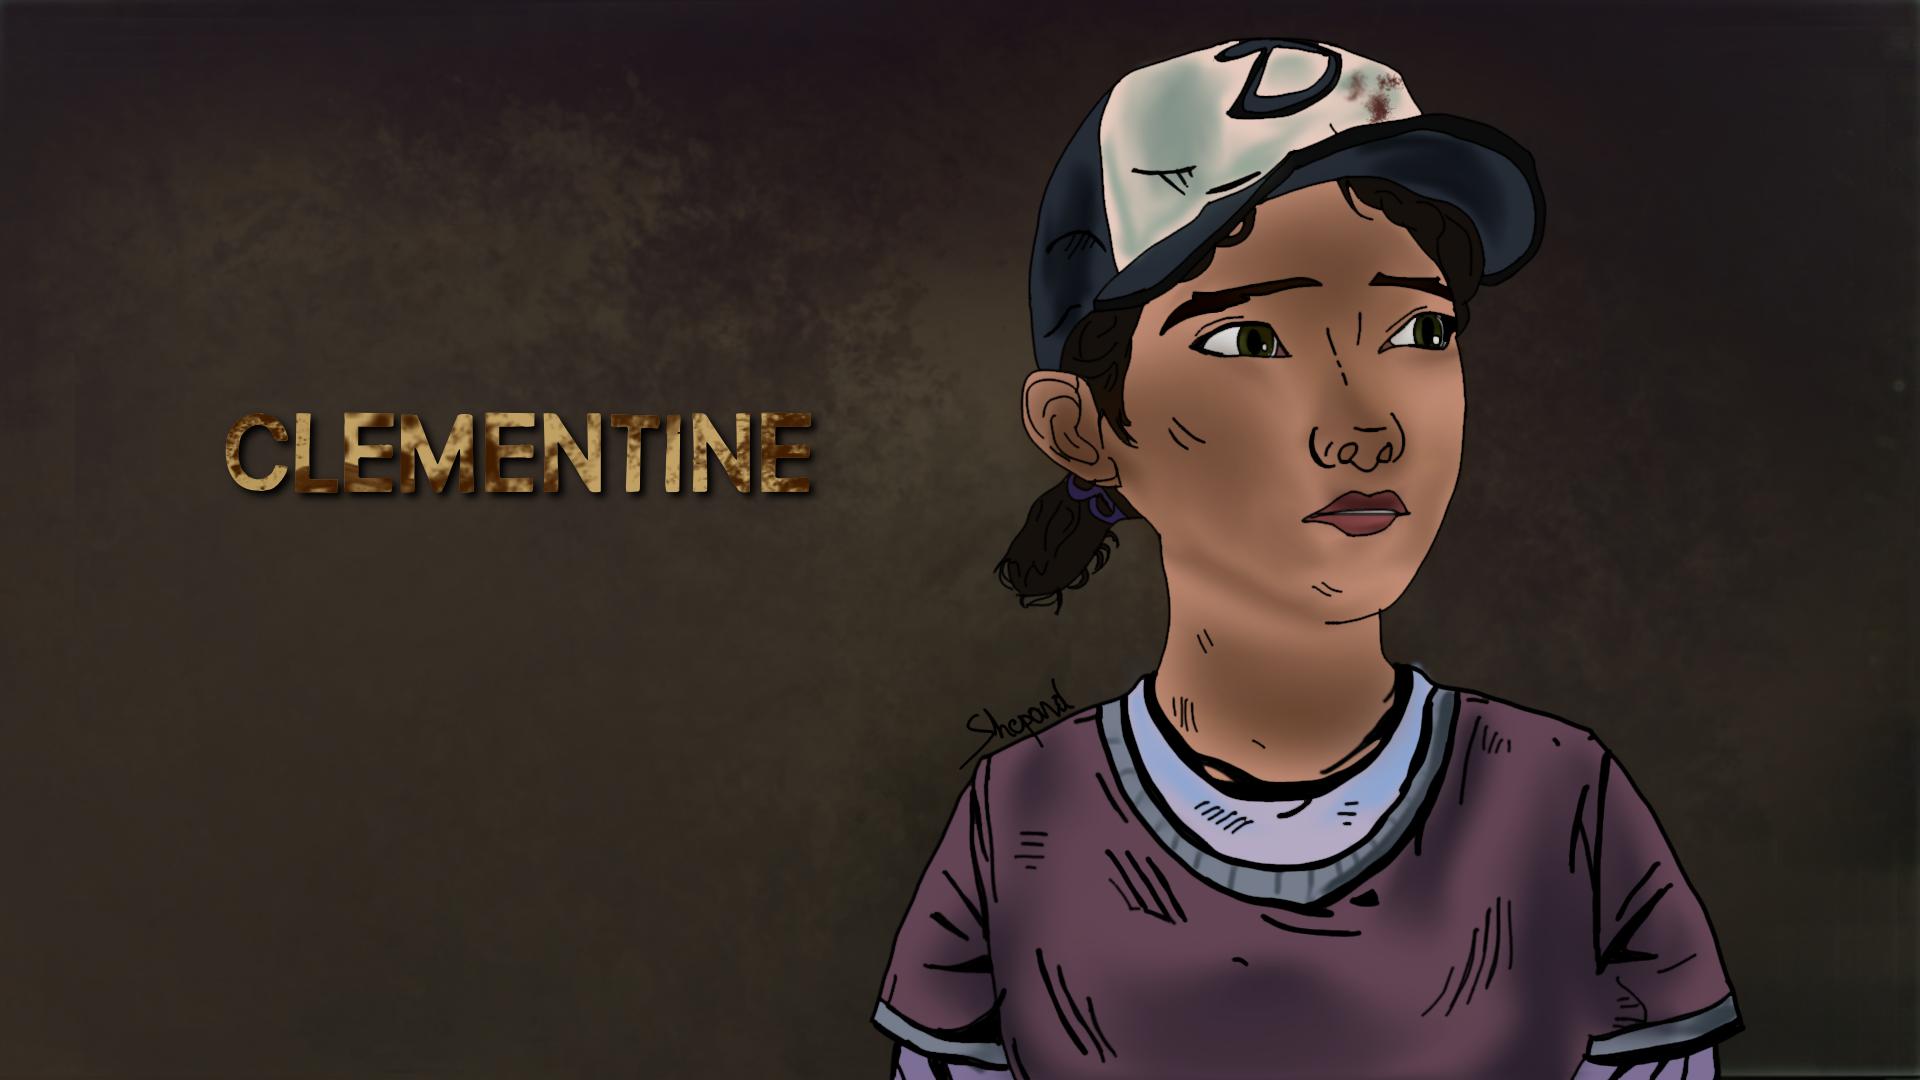 Clementine The Walking Dead Season 2 By Darkshepard666 On